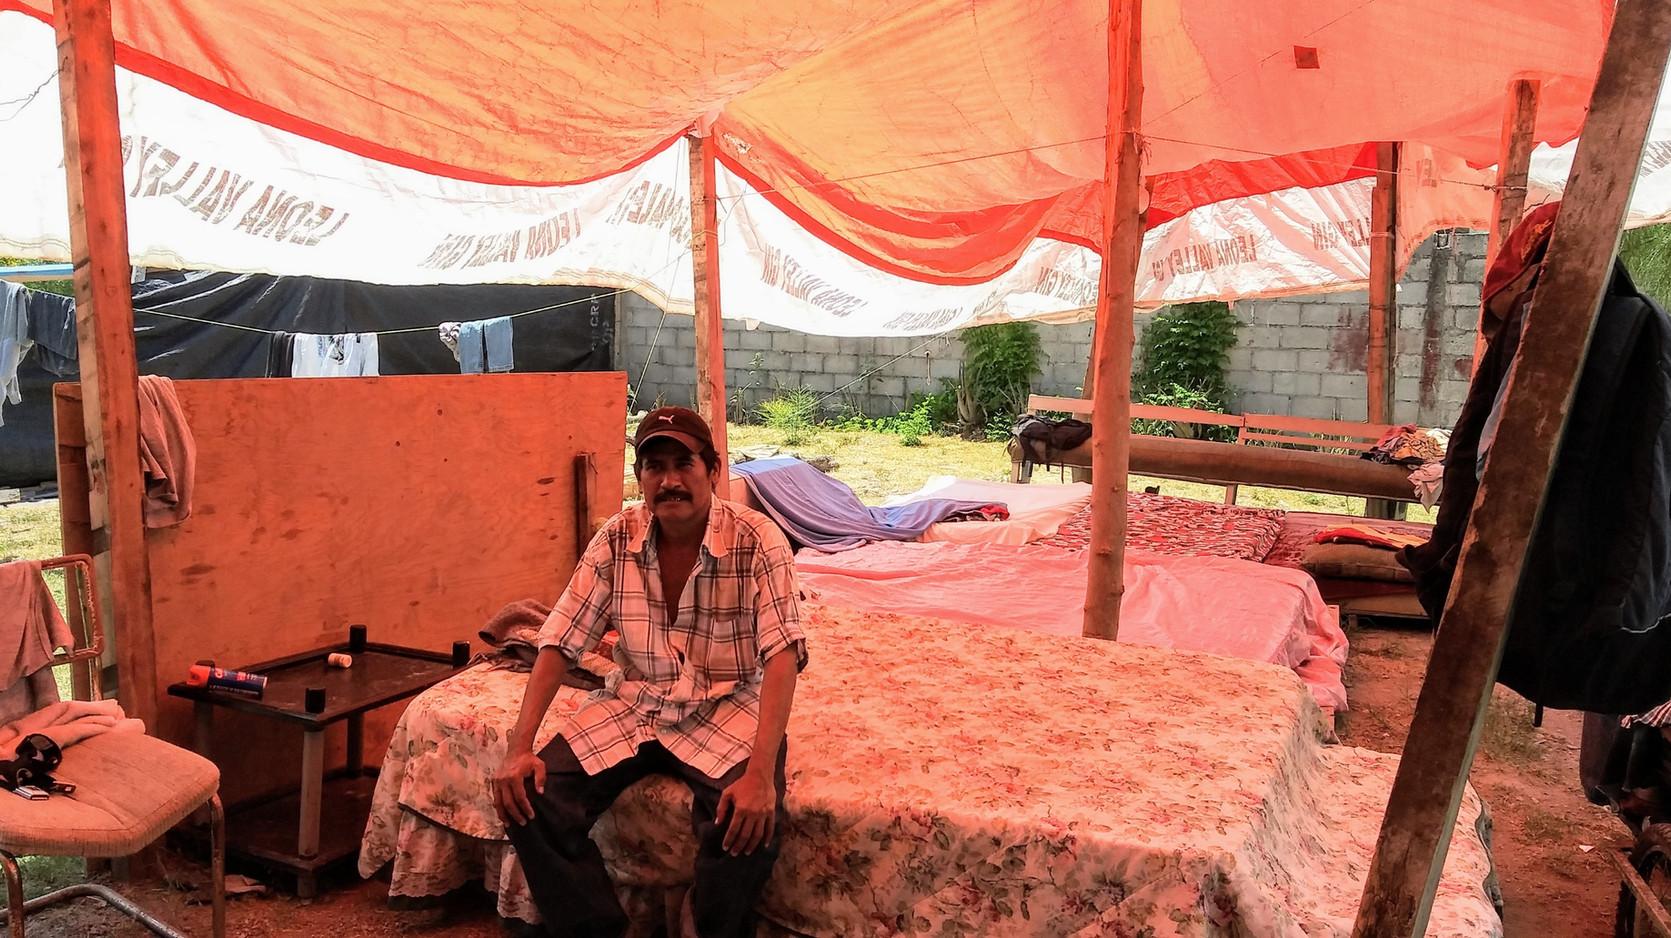 Men sleep outside under tarps